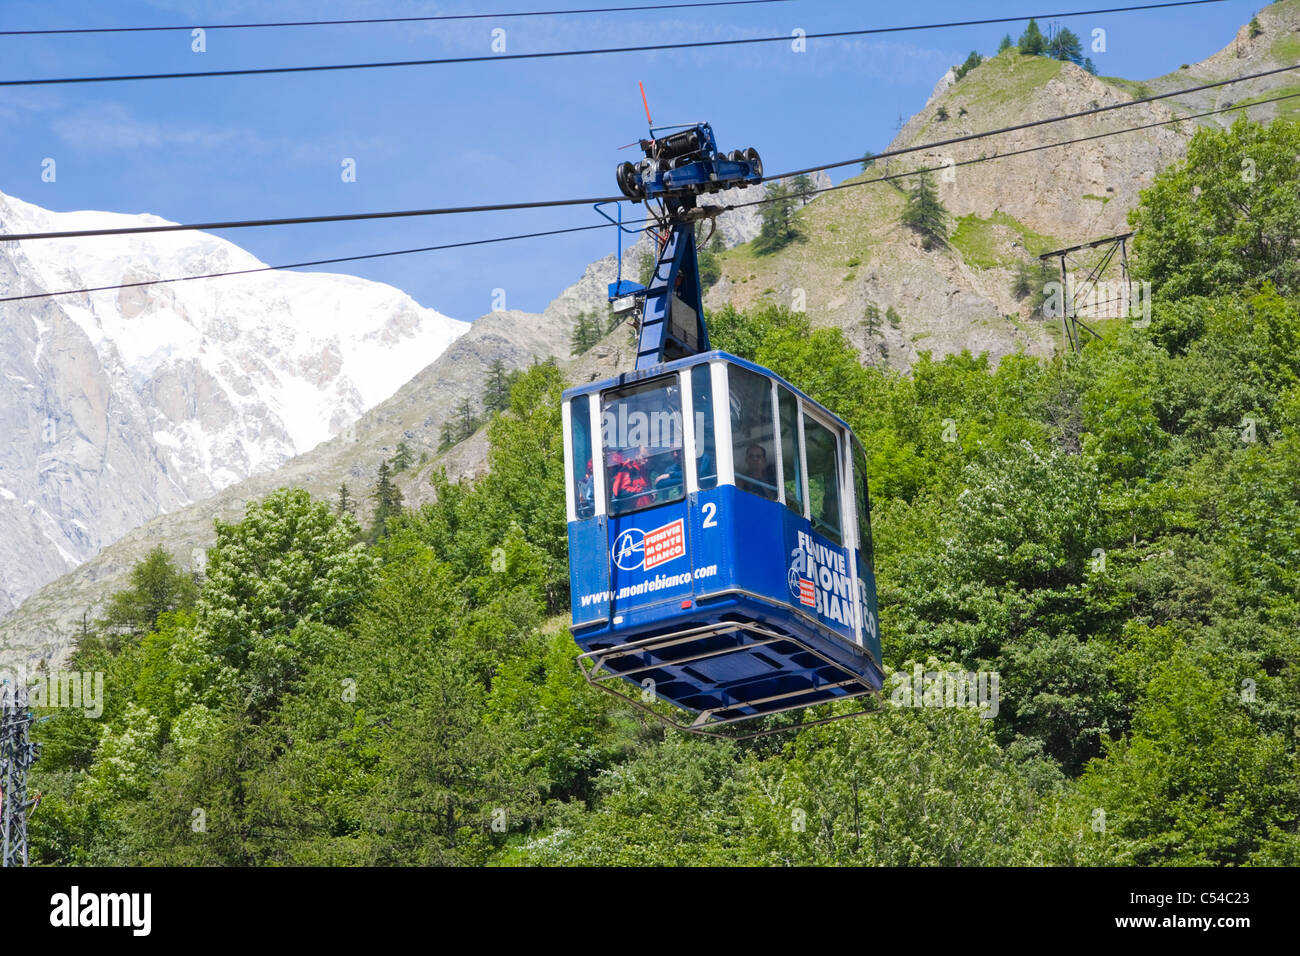 mont blanc mountain cable car